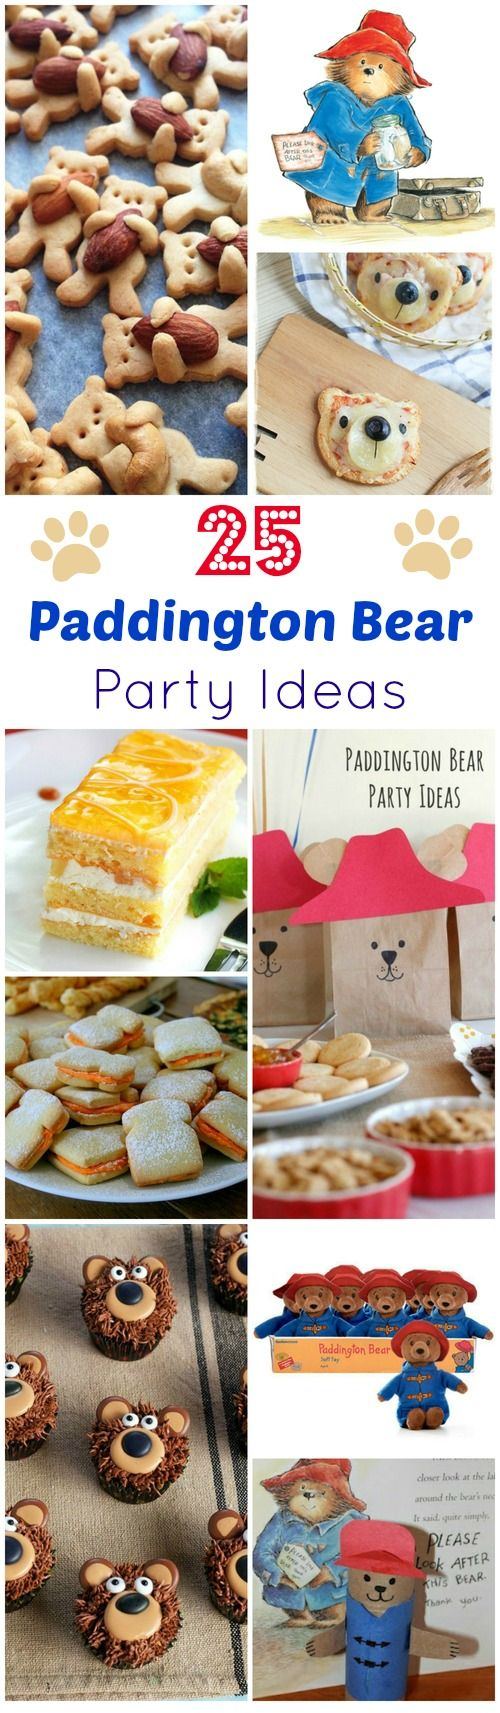 Paddington is back! 25 Paddington Bear Party Ideas. Perfect for classroom visit w/ #PaddingtonBear